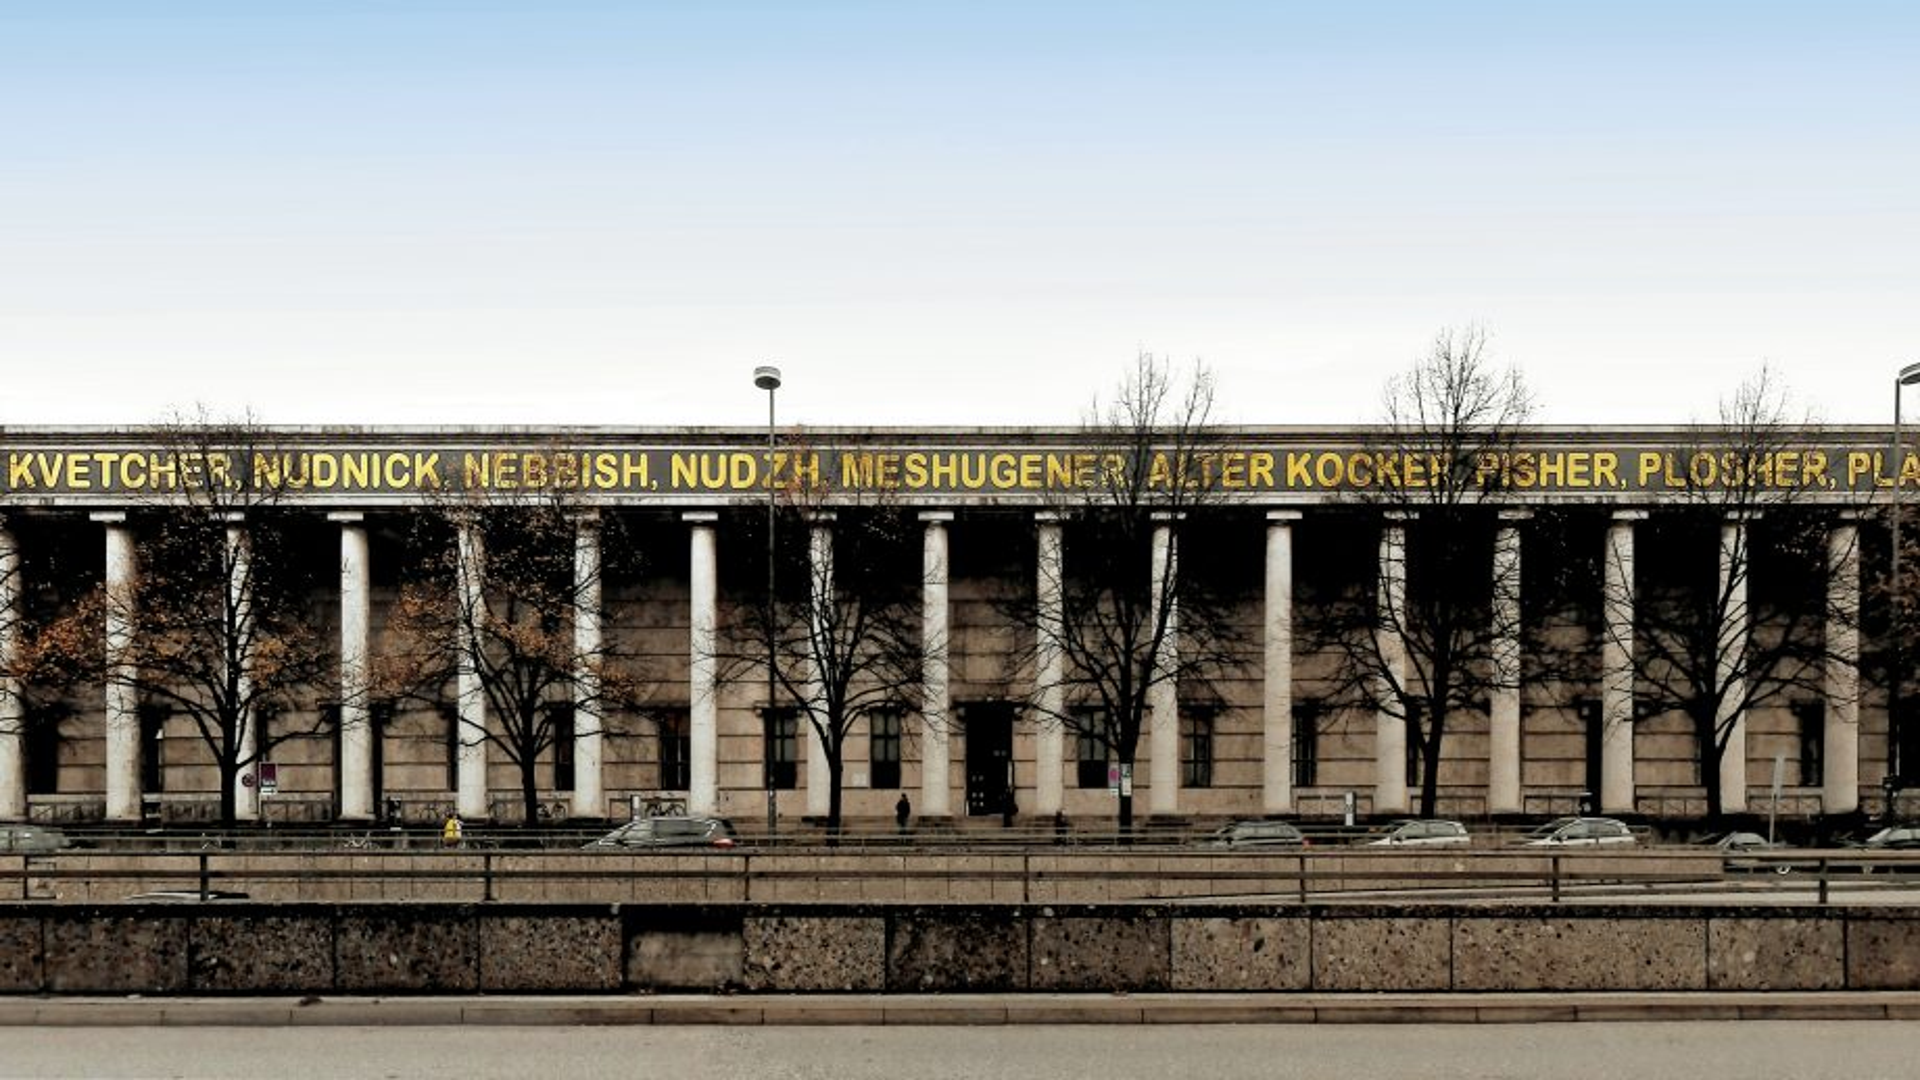 Haus der Kunst continues to face turmoil